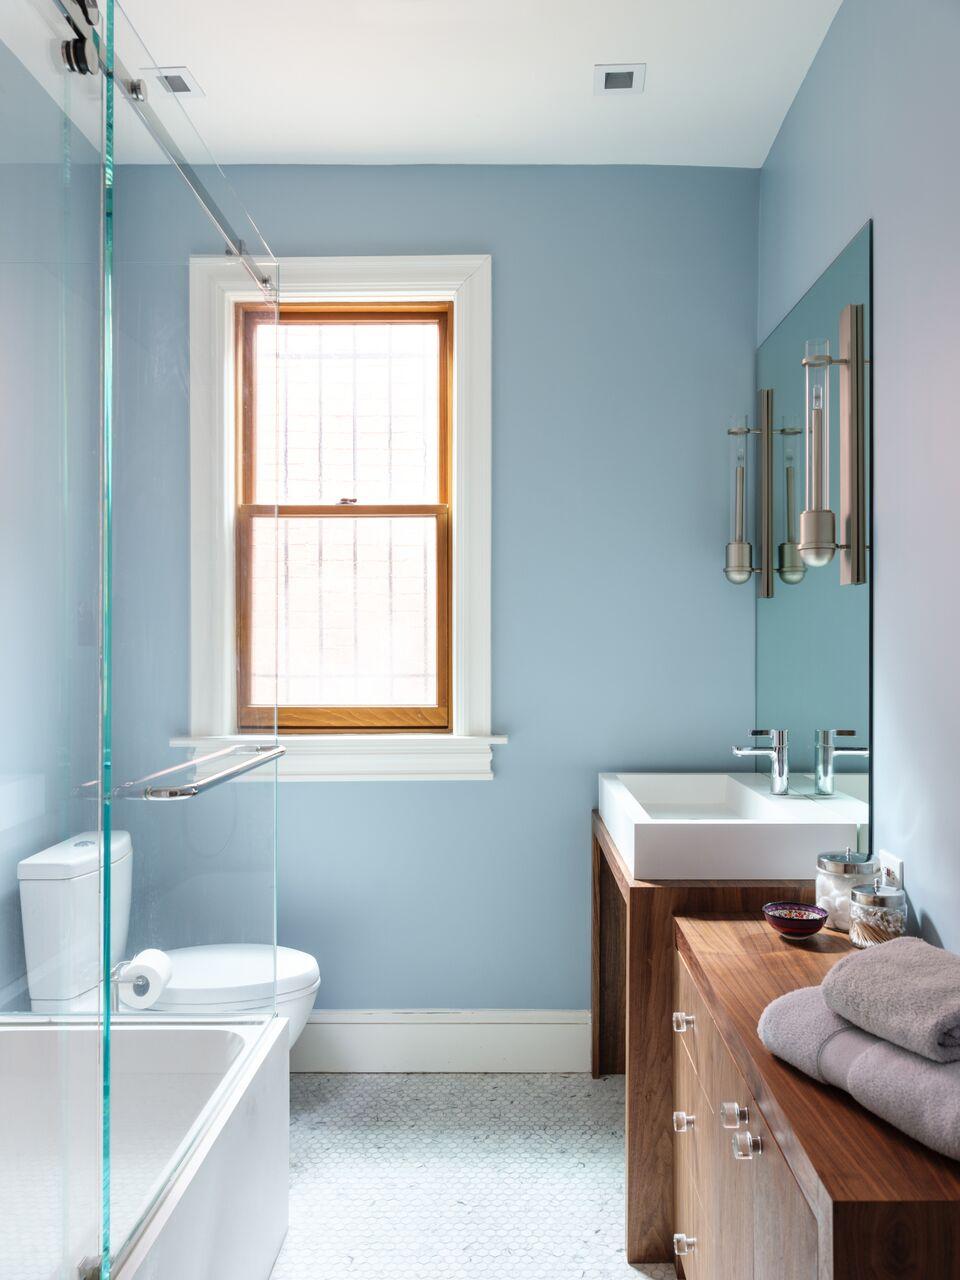 Master Bath, Washington, DC Porcelanosa, Bel Pre Glass, Urban Electric Co., Badeloft Solid Surface Sink, Architectural Ceramics, Artistic Tile, Virginia Mountain Woodworks.